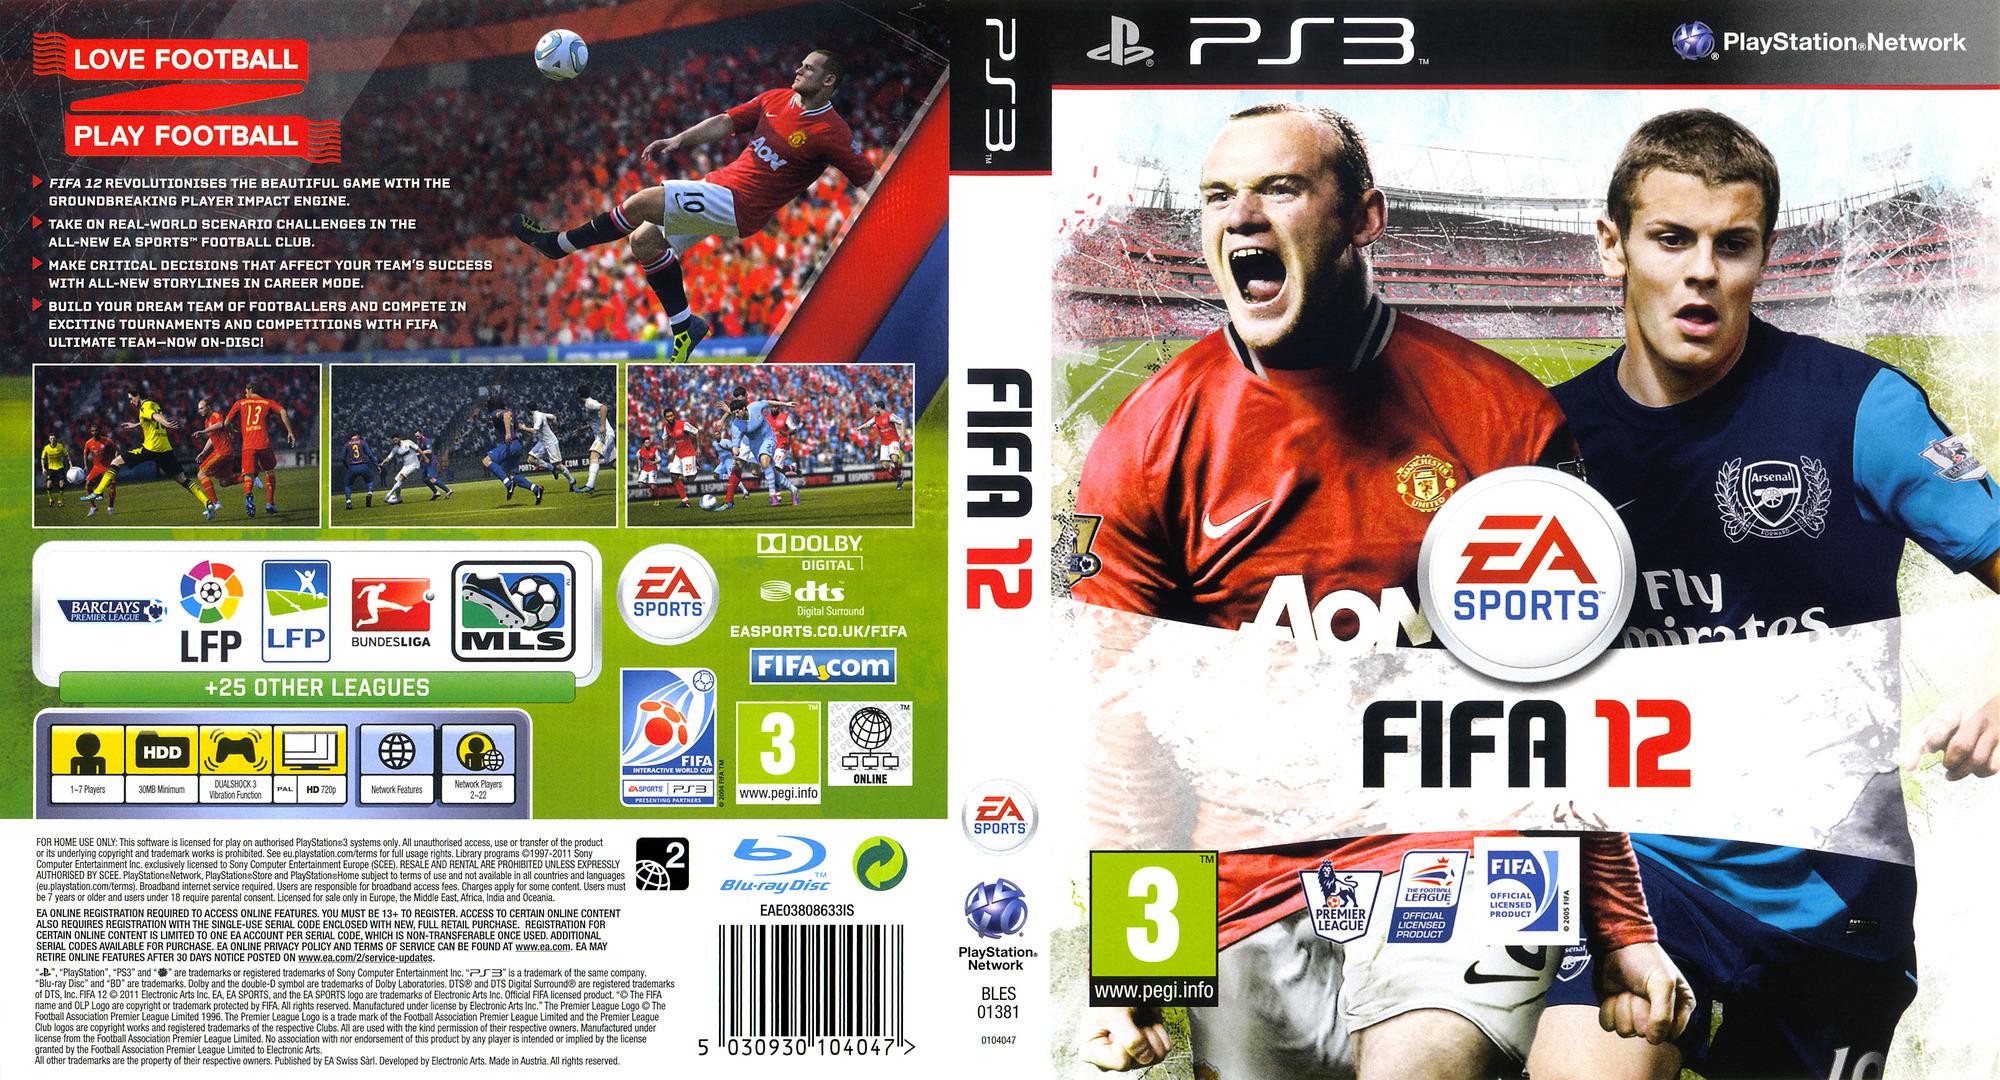 FIFA 12 PS3 coverfullHQ (BLES01381)